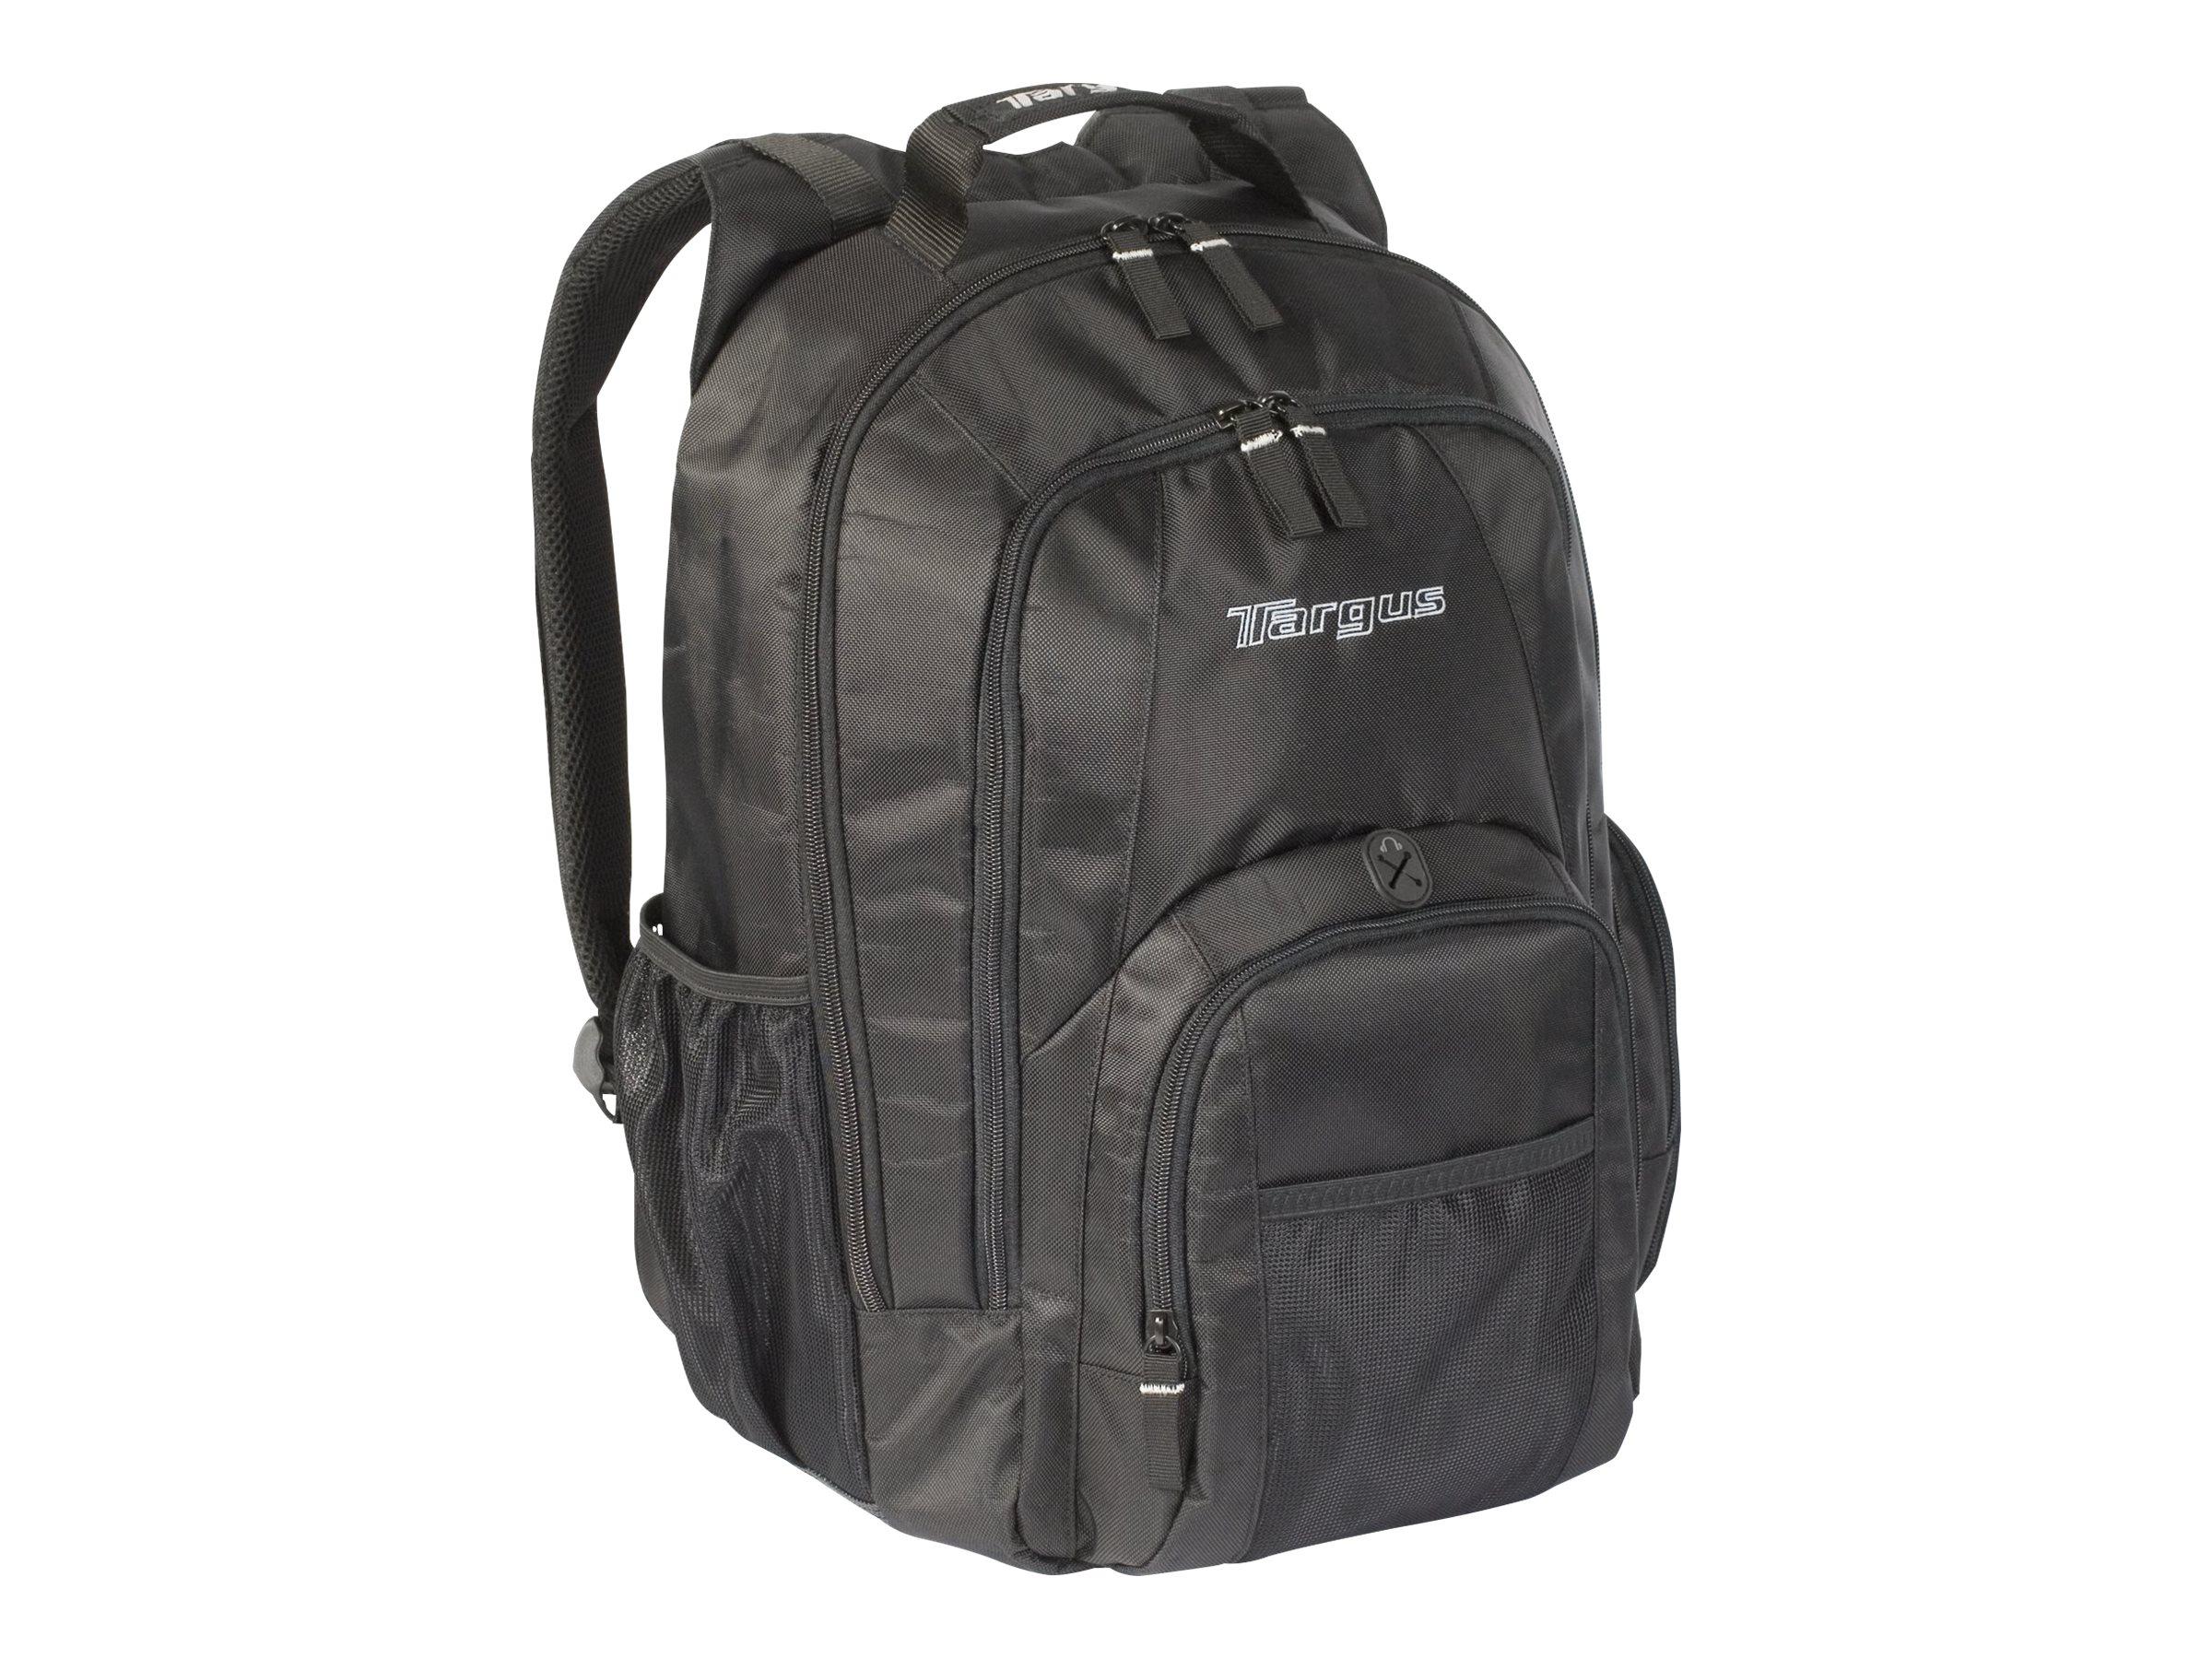 Targus 16 Groove Notebook Backpack Case, CVR600, 4838767, Carrying Cases - Notebook